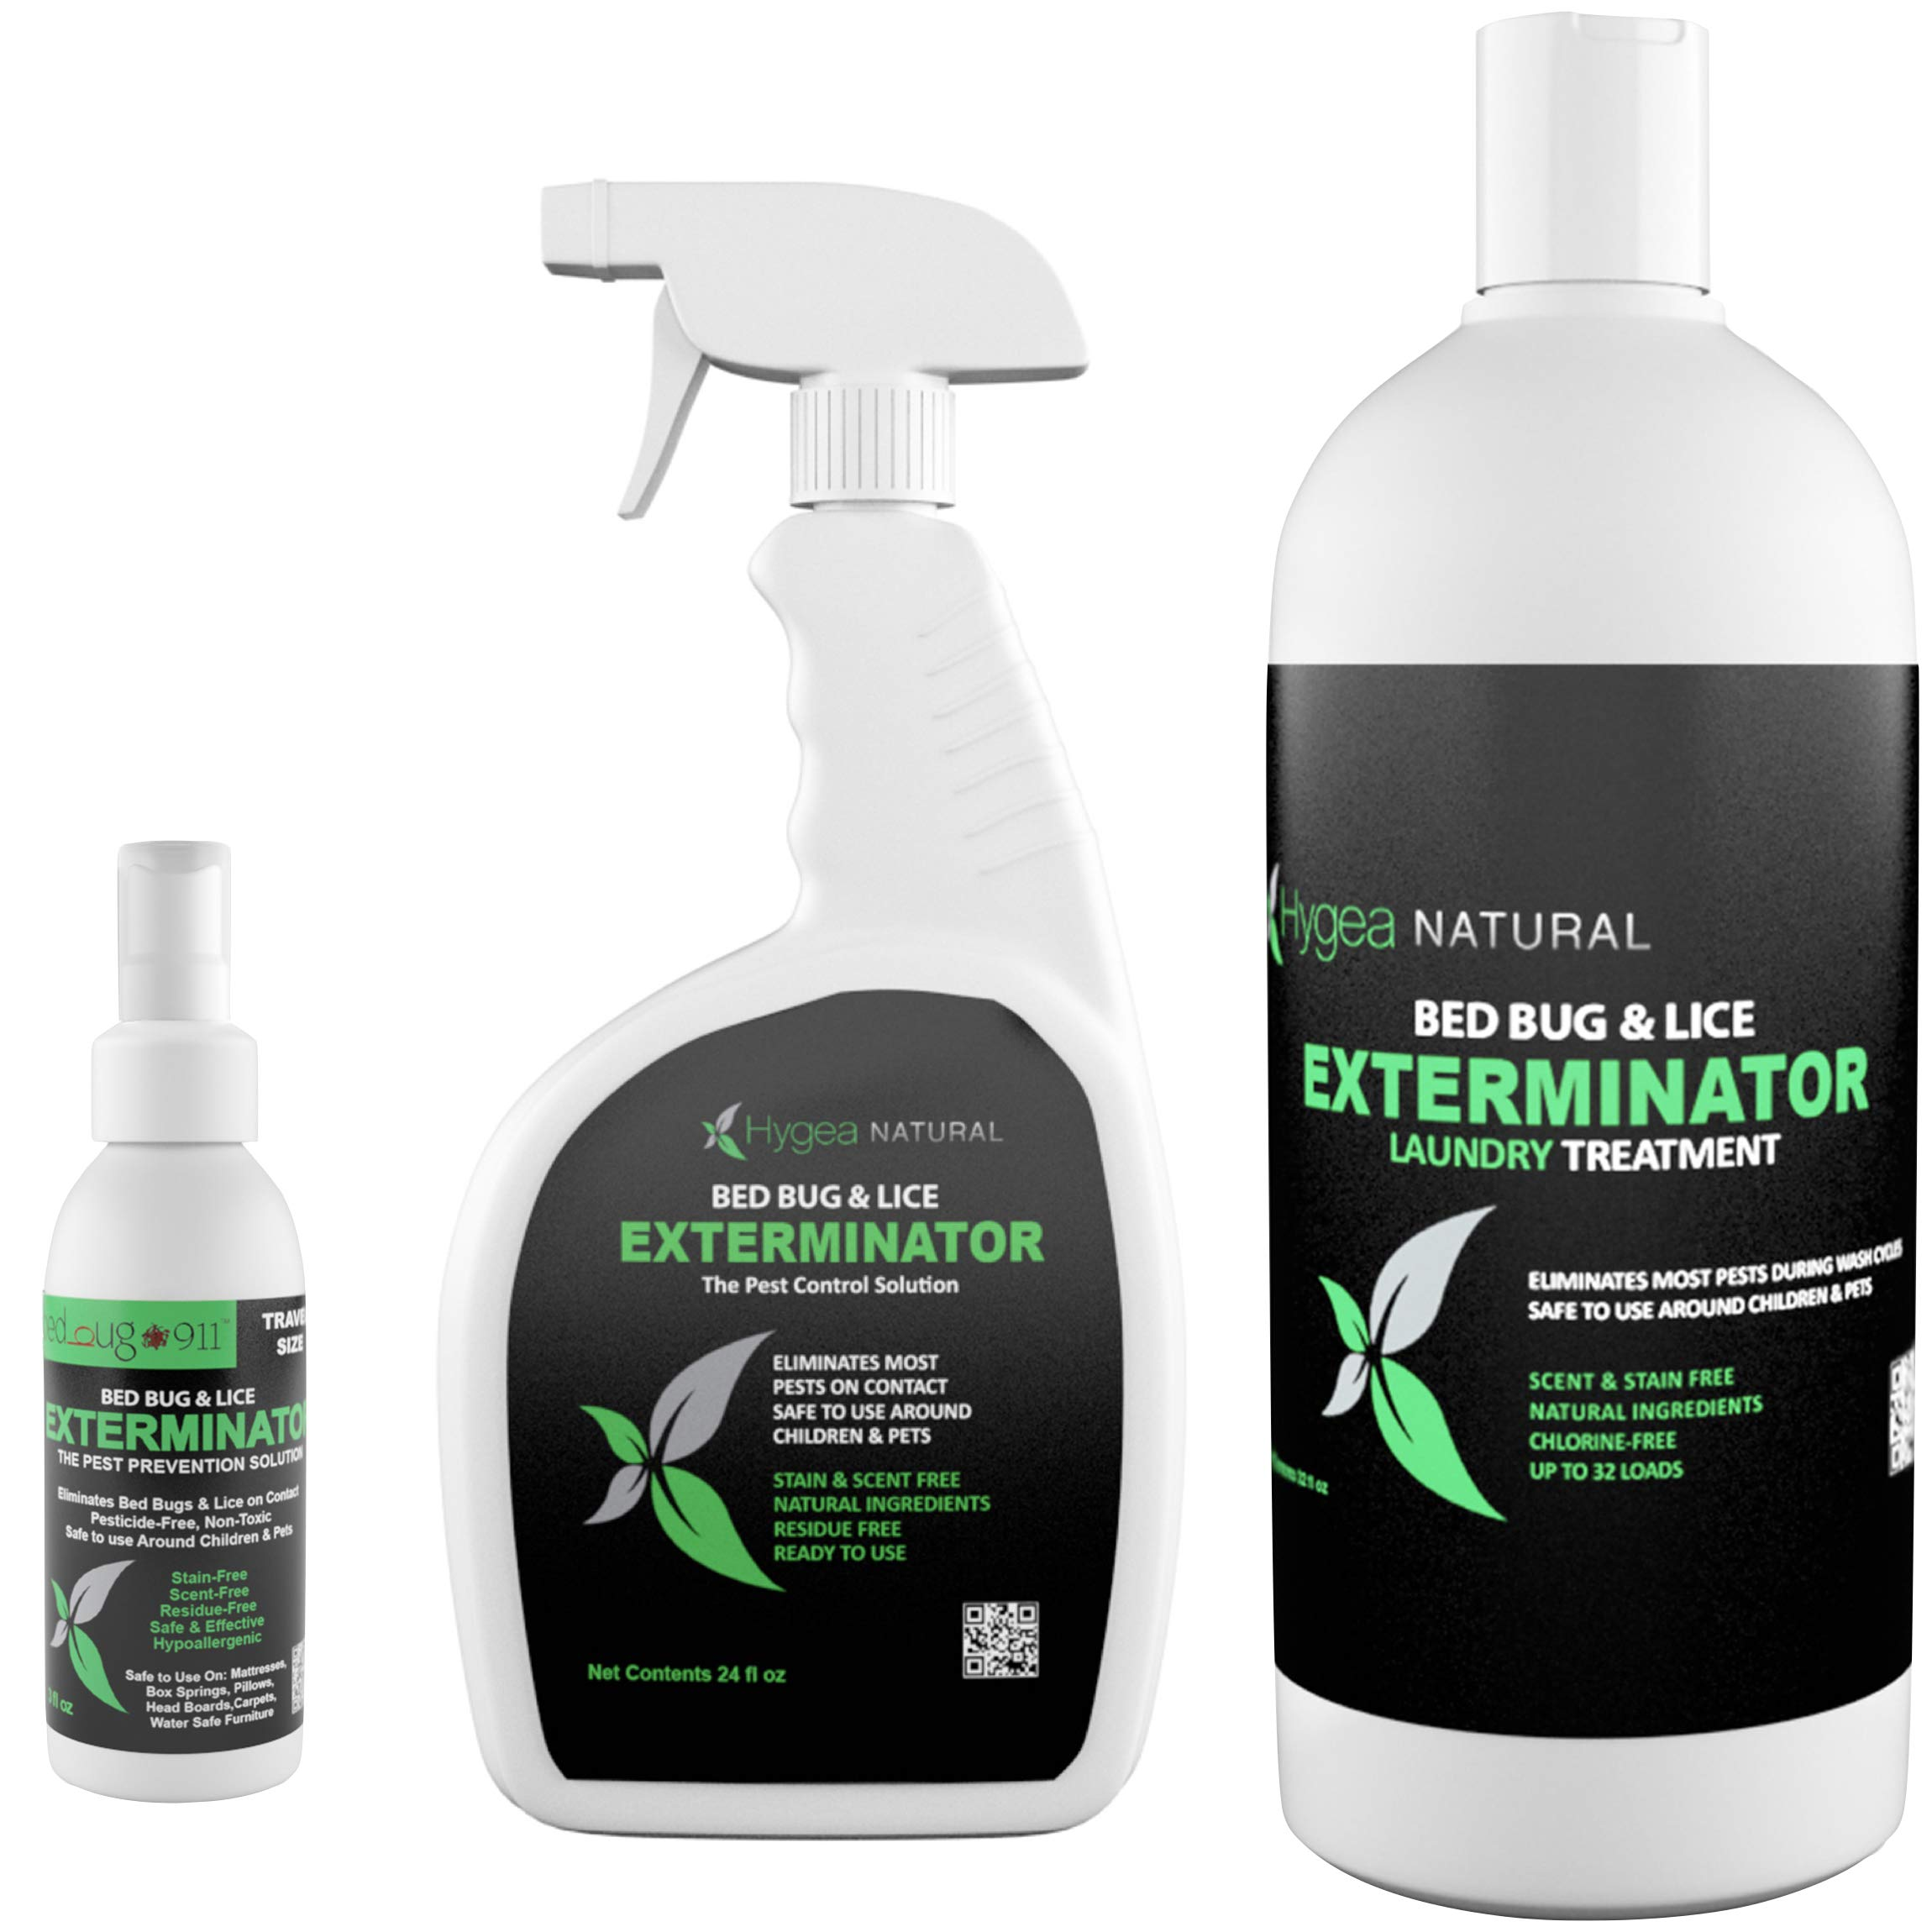 Hygea Natural Exterminator Combo Pack, Non Toxic Treatment, Natural Bugs & Lice Eradicator, Includes Spray 24 oz, Travel Spray 3 oz & Laundry Treatment 32 oz by Hygea Natural